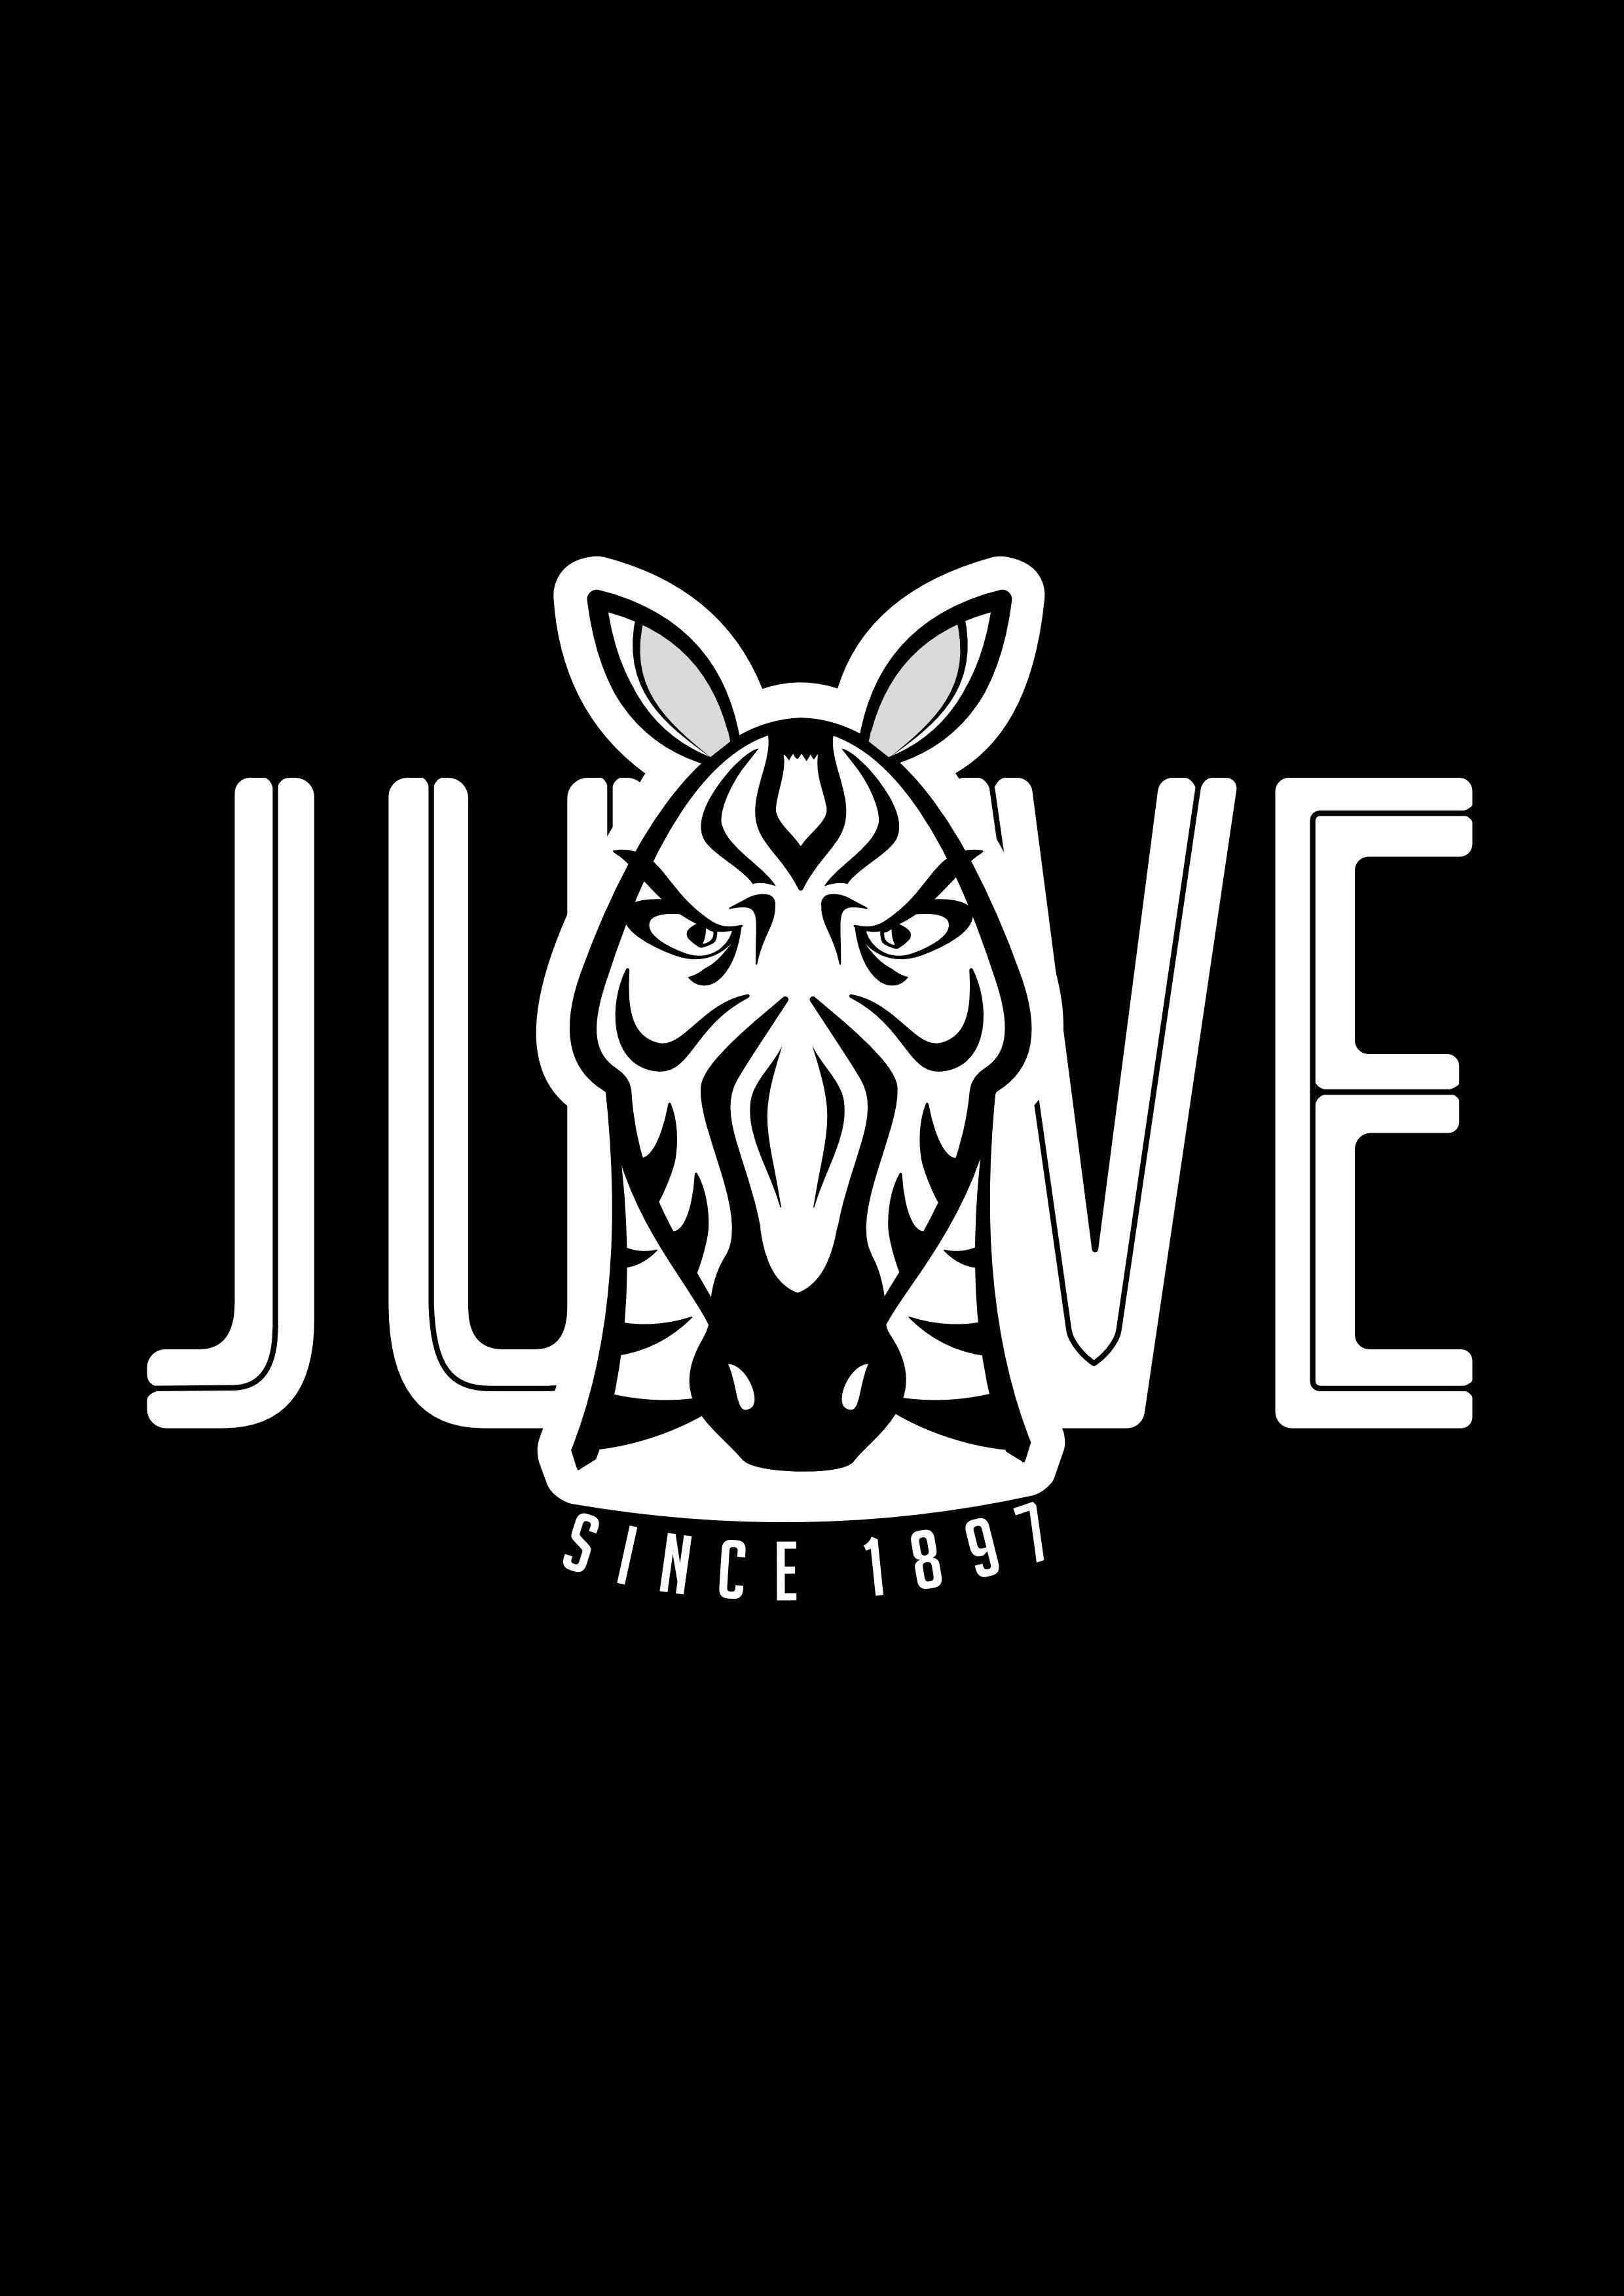 Amazing Wallpaper Logo Juventus - 756d58aeace5dc245f60b39e2b34bdb2  Pictures_798941.jpg